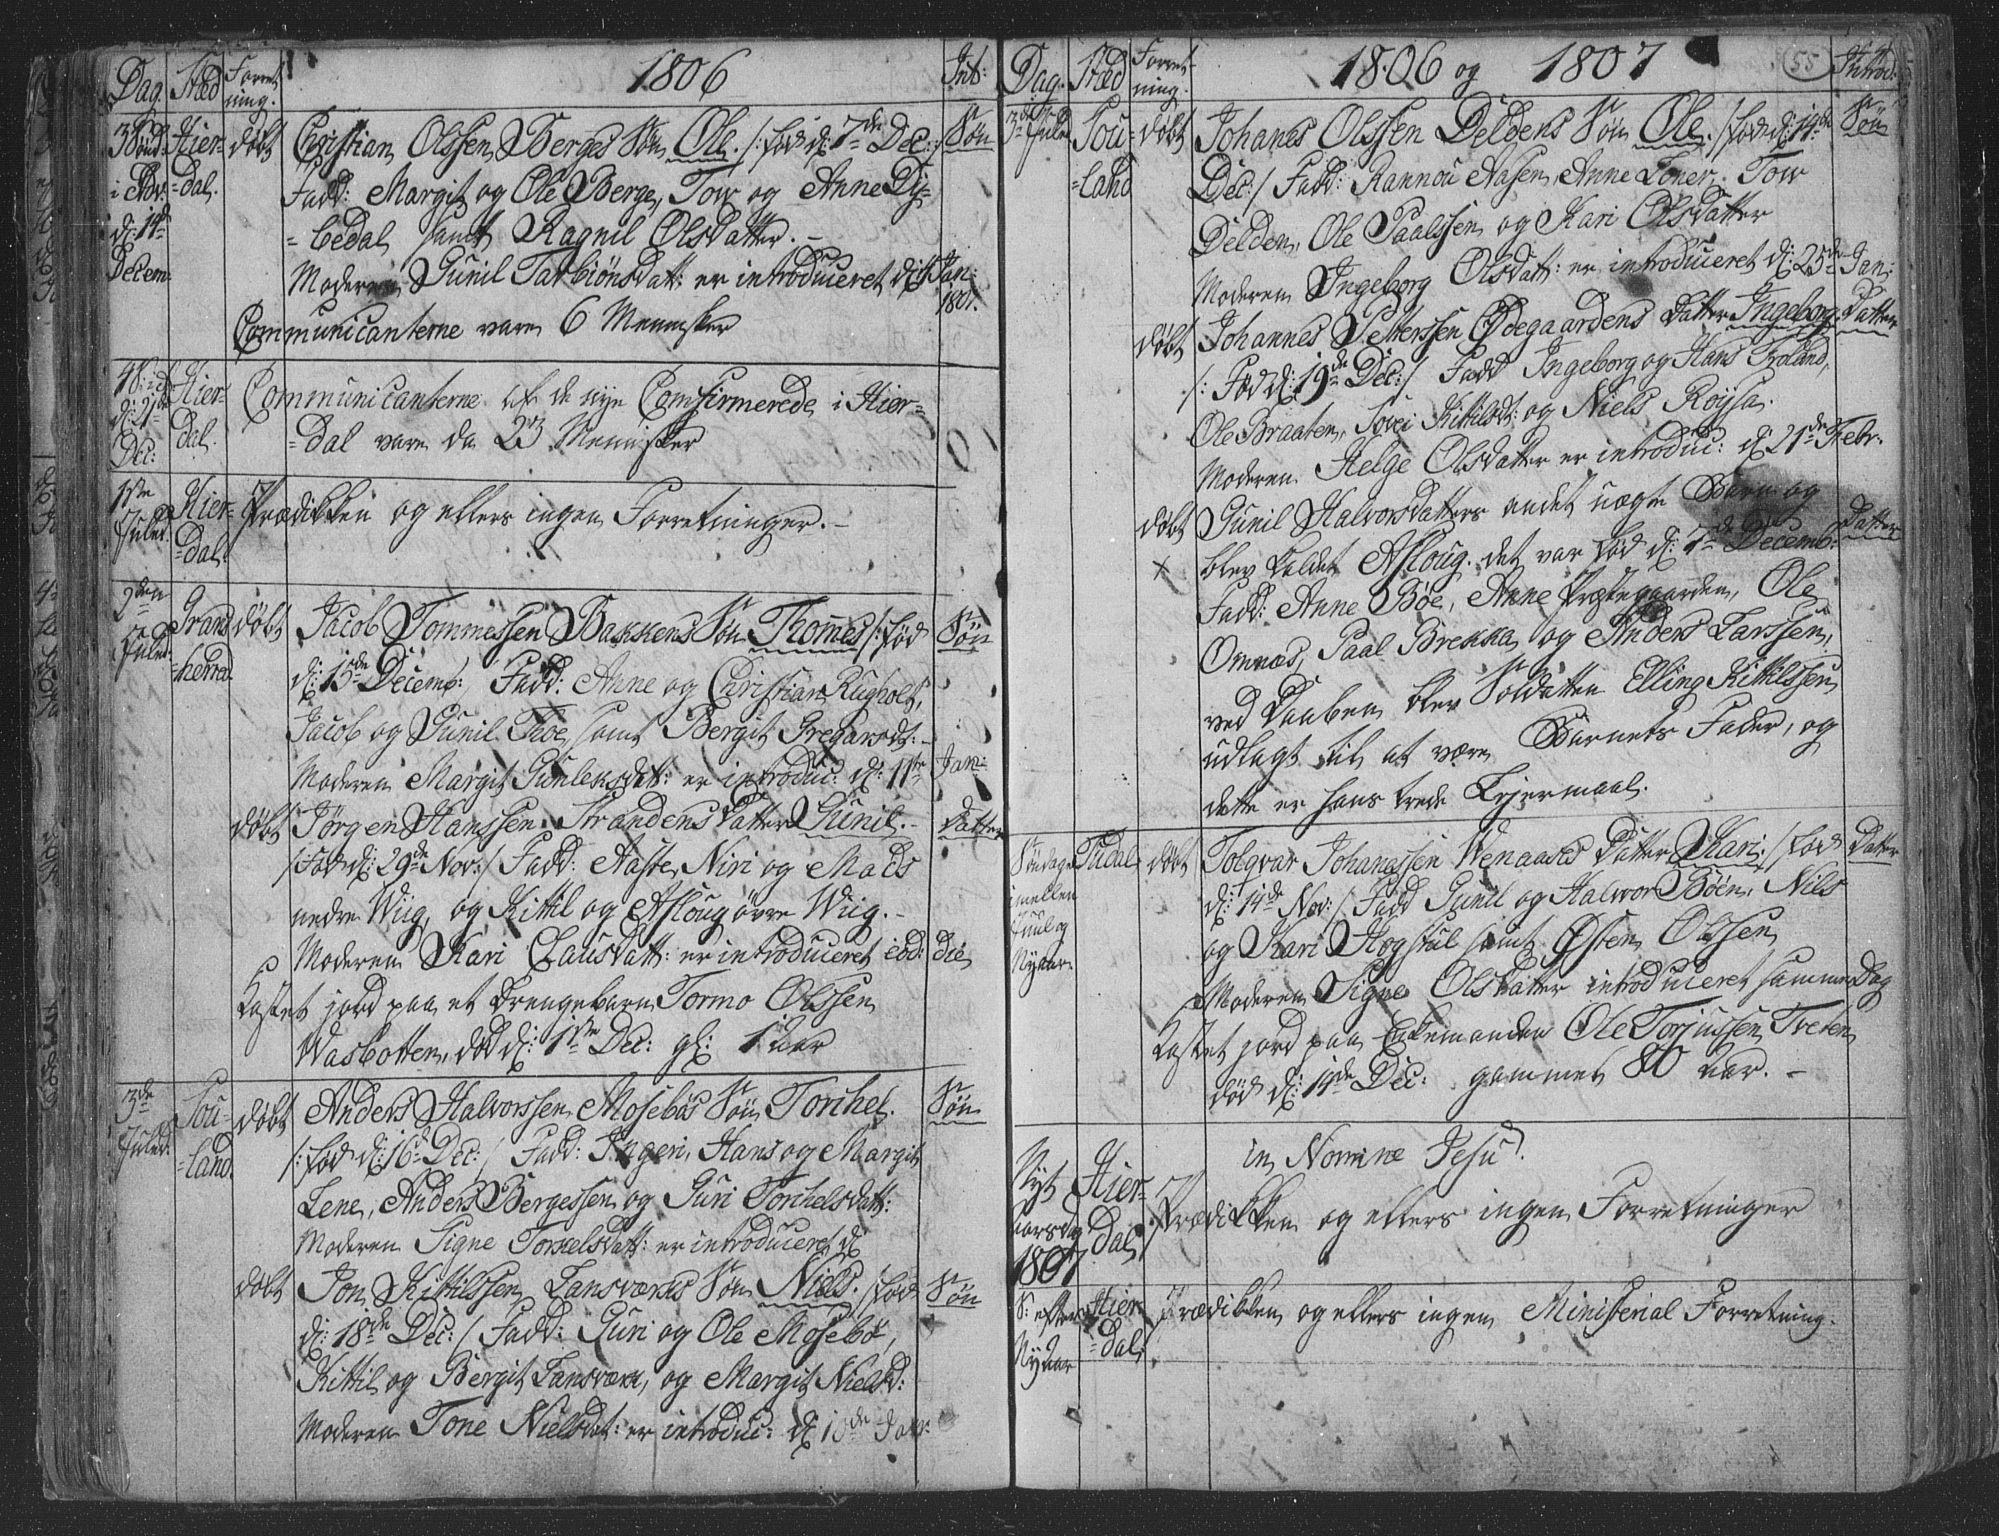 SAKO, Hjartdal kirkebøker, F/Fa/L0006: Ministerialbok nr. I 6, 1801-1814, s. 55